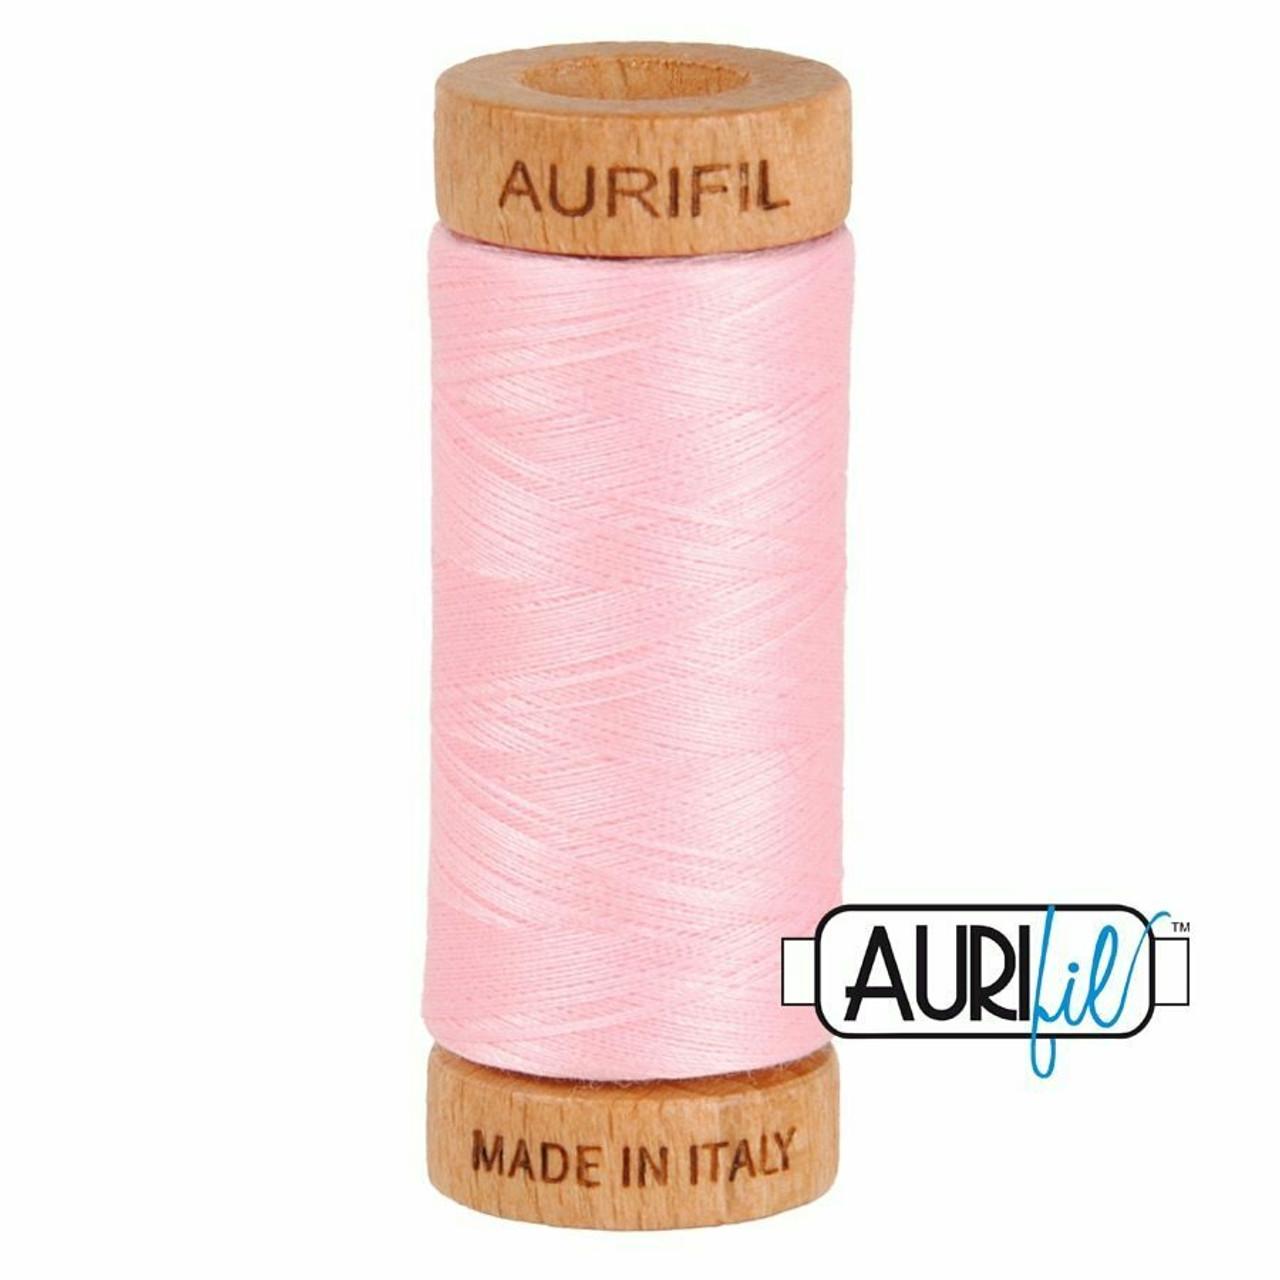 Aurifil 80wt Baby Pink (2423) thread